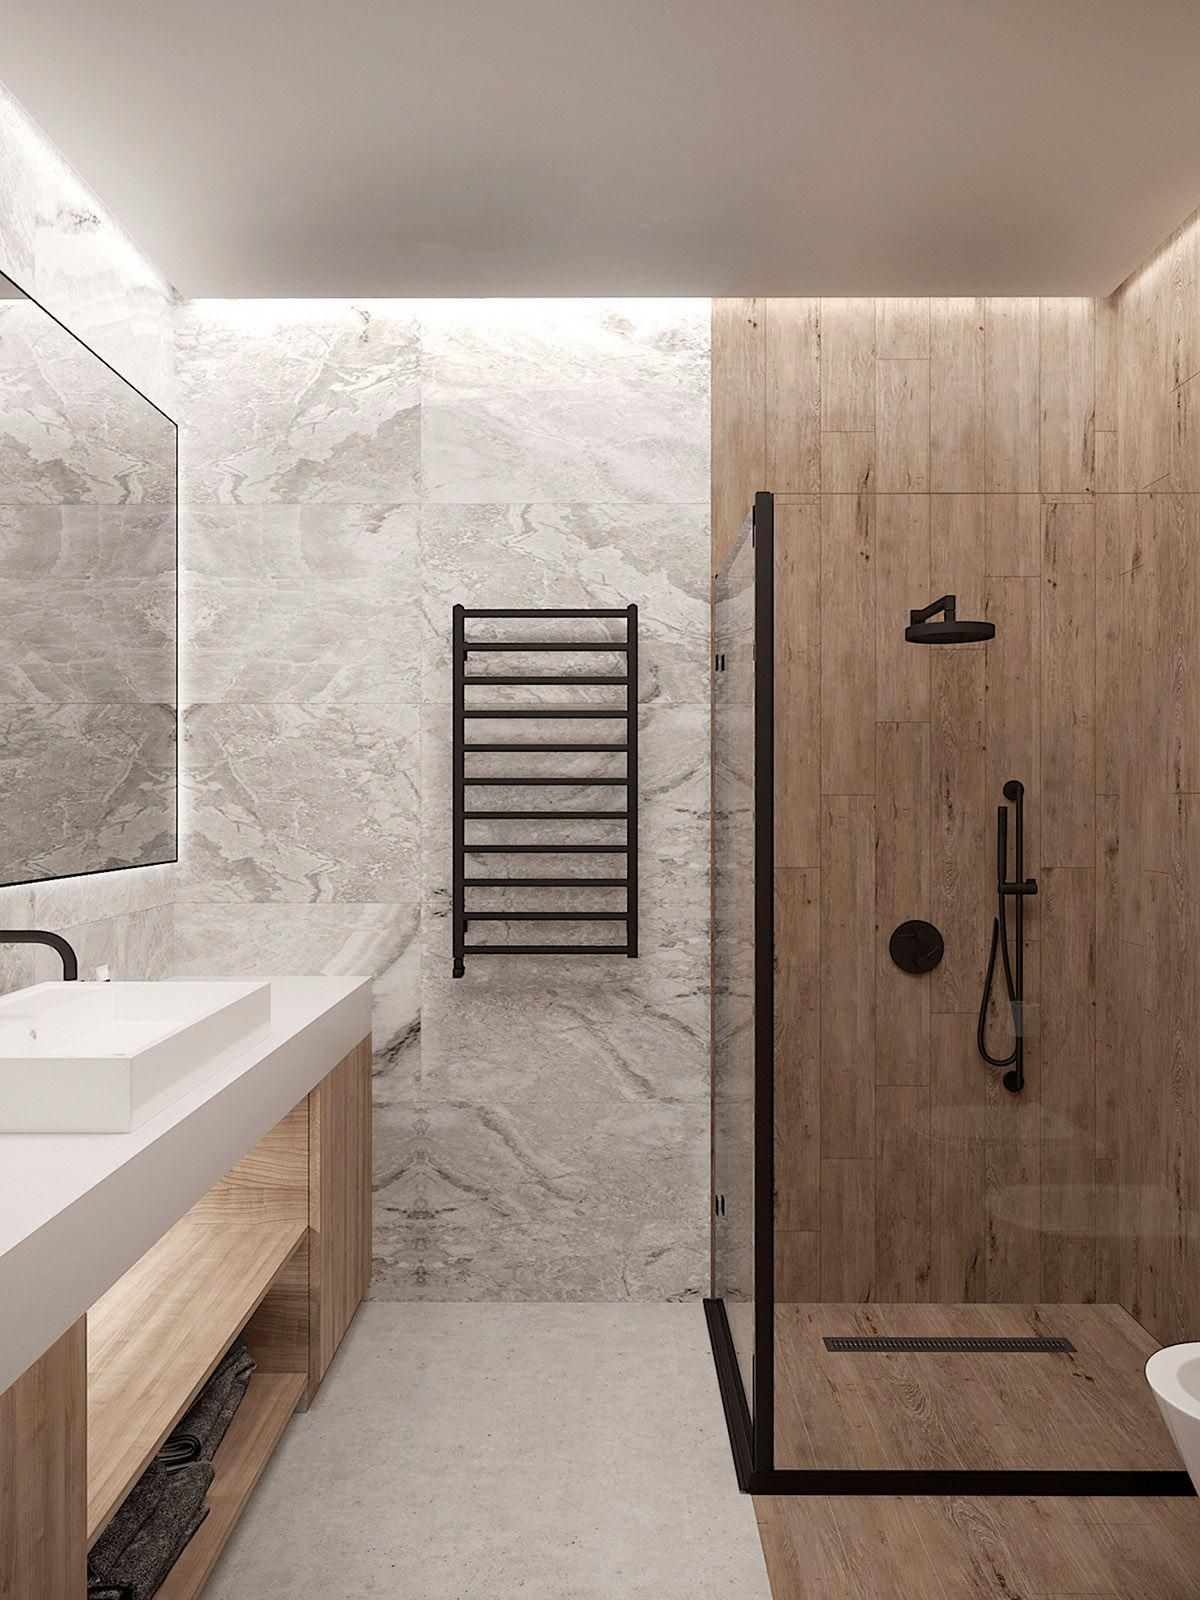 3 Small Home Interiors With Their Own Sense Of Style Homeinteriordesign Bathroom Design Small Bathroom Interior Design Small Bathroom Design Small home bathroom design ideas